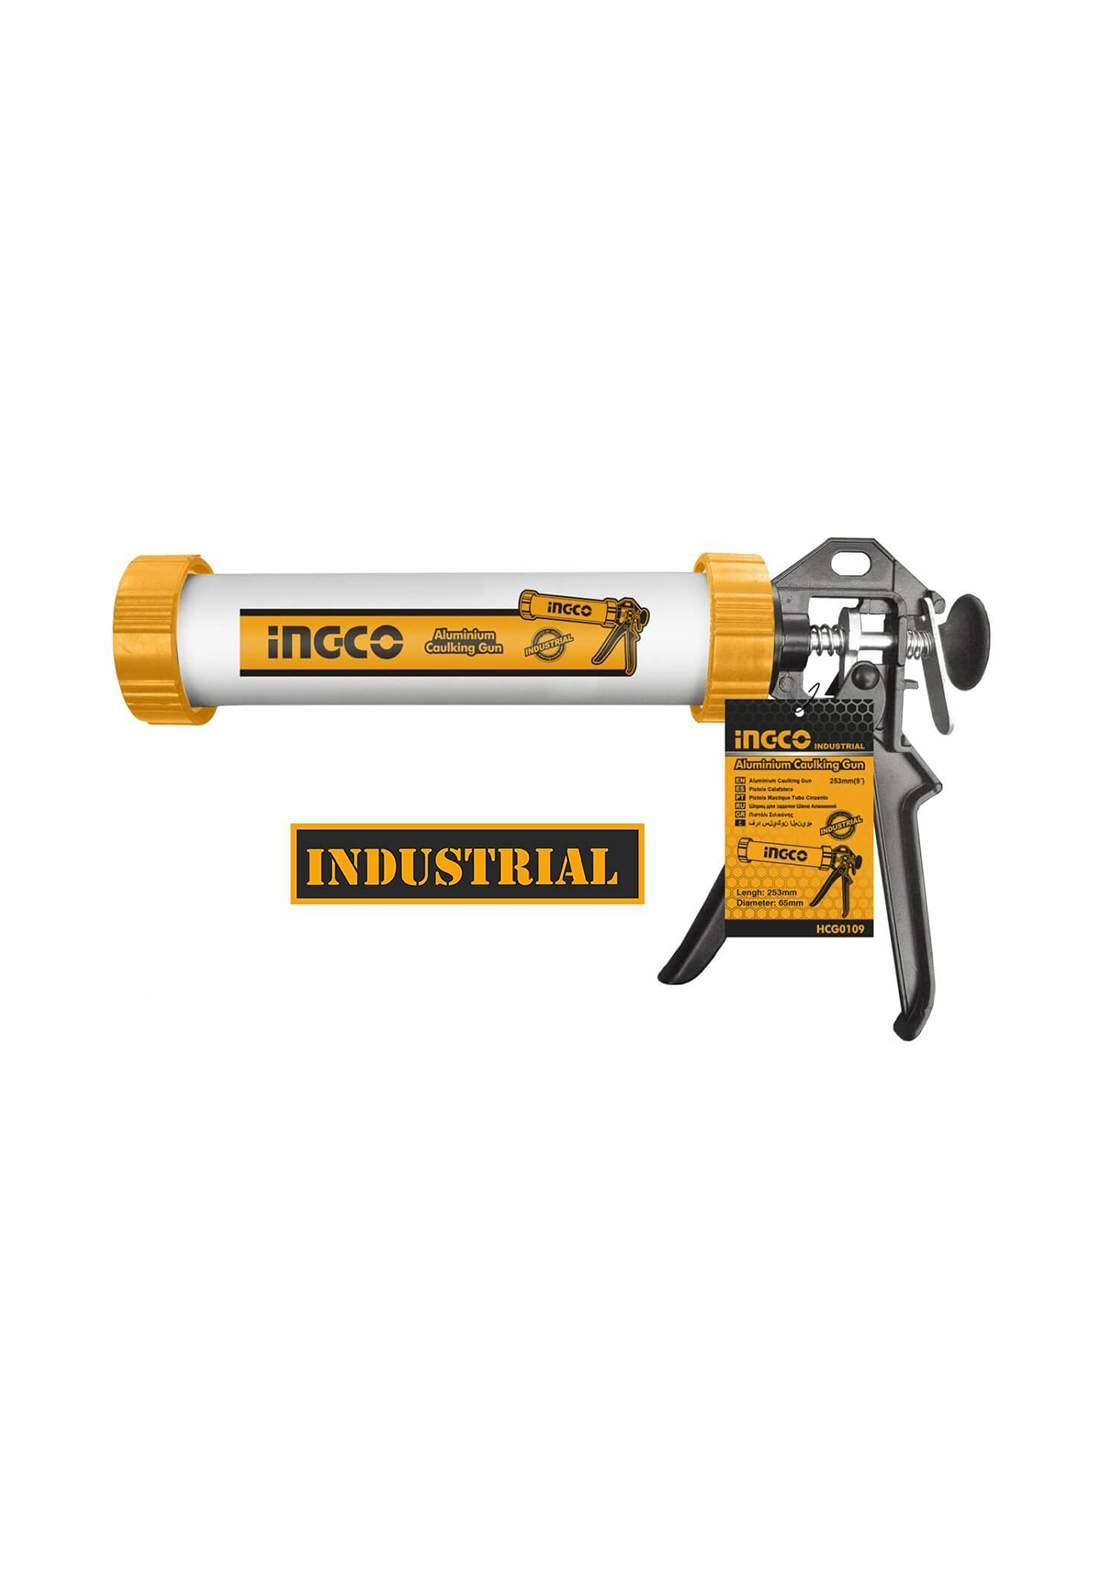 Ingco HCG0109 Aluminium caulking gun - 230MM مسدس سيلكون